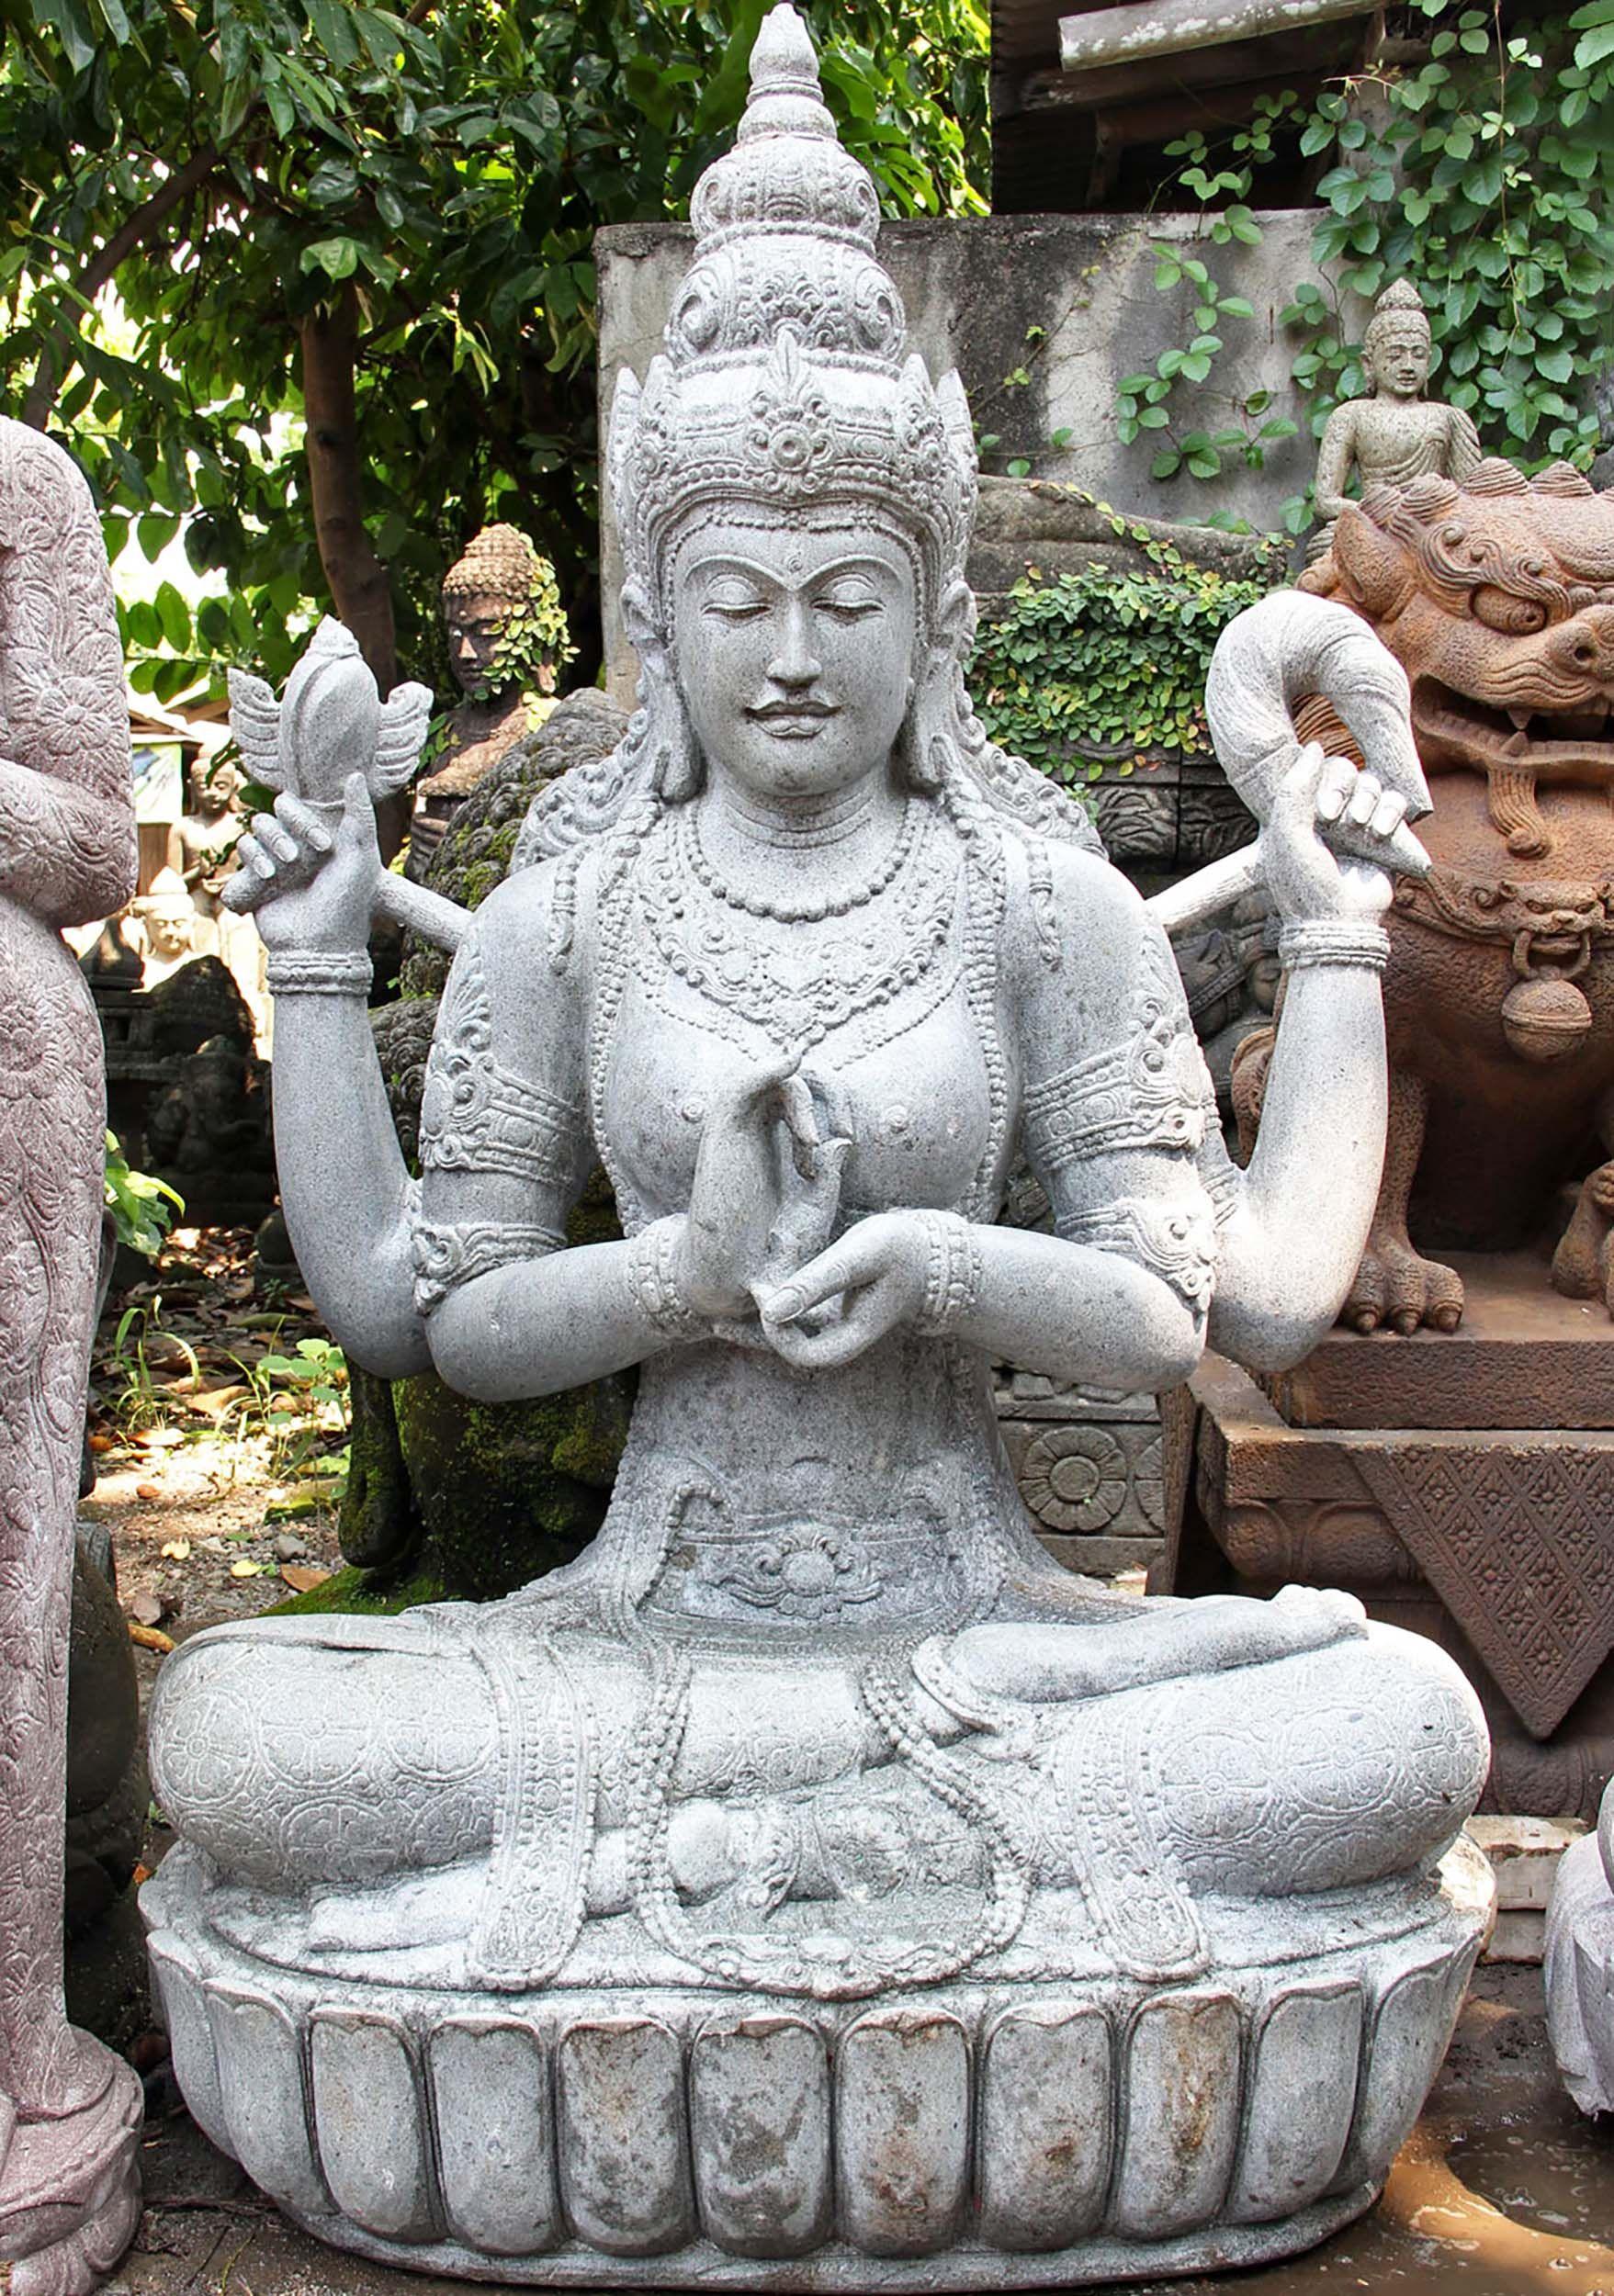 View the Stone Dharmachakra Lakshmi Garden Statue 61